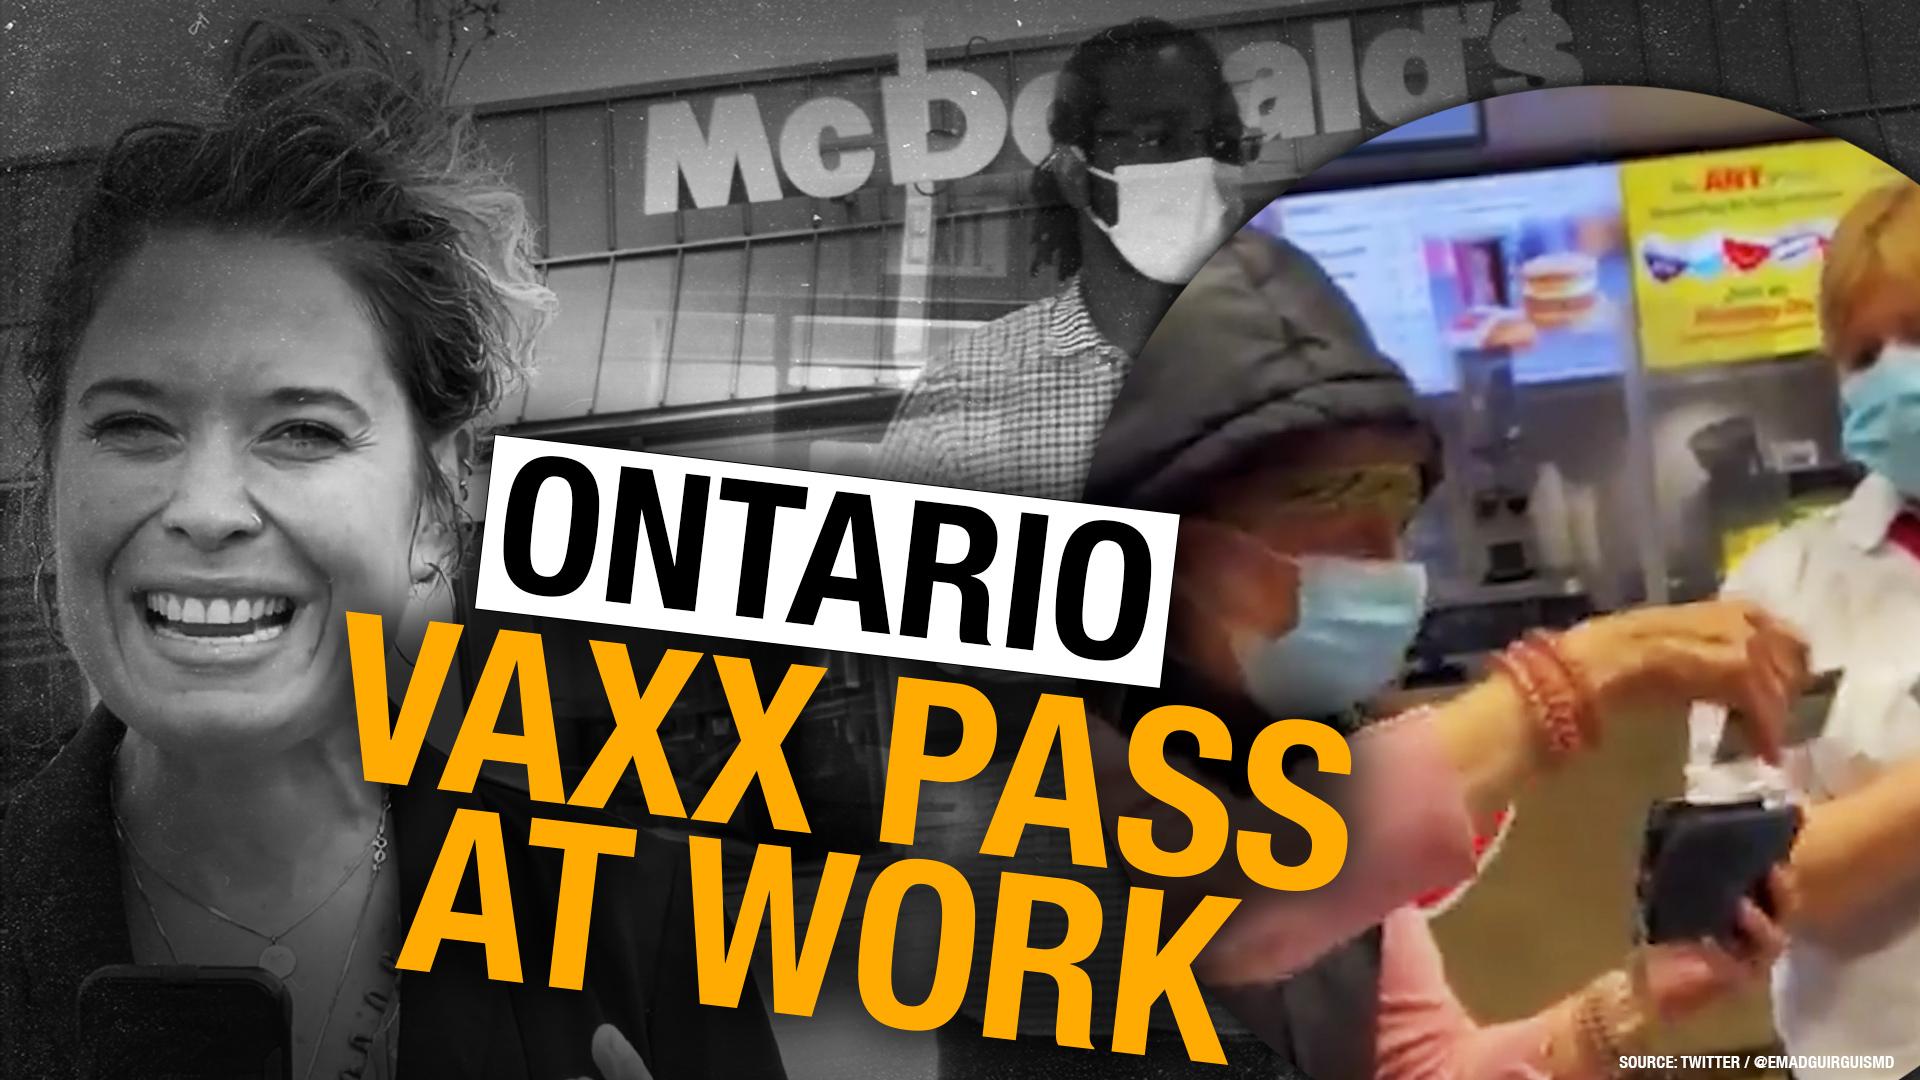 Toronto-area McDonald's kicks out elderly customer for not having vax proof